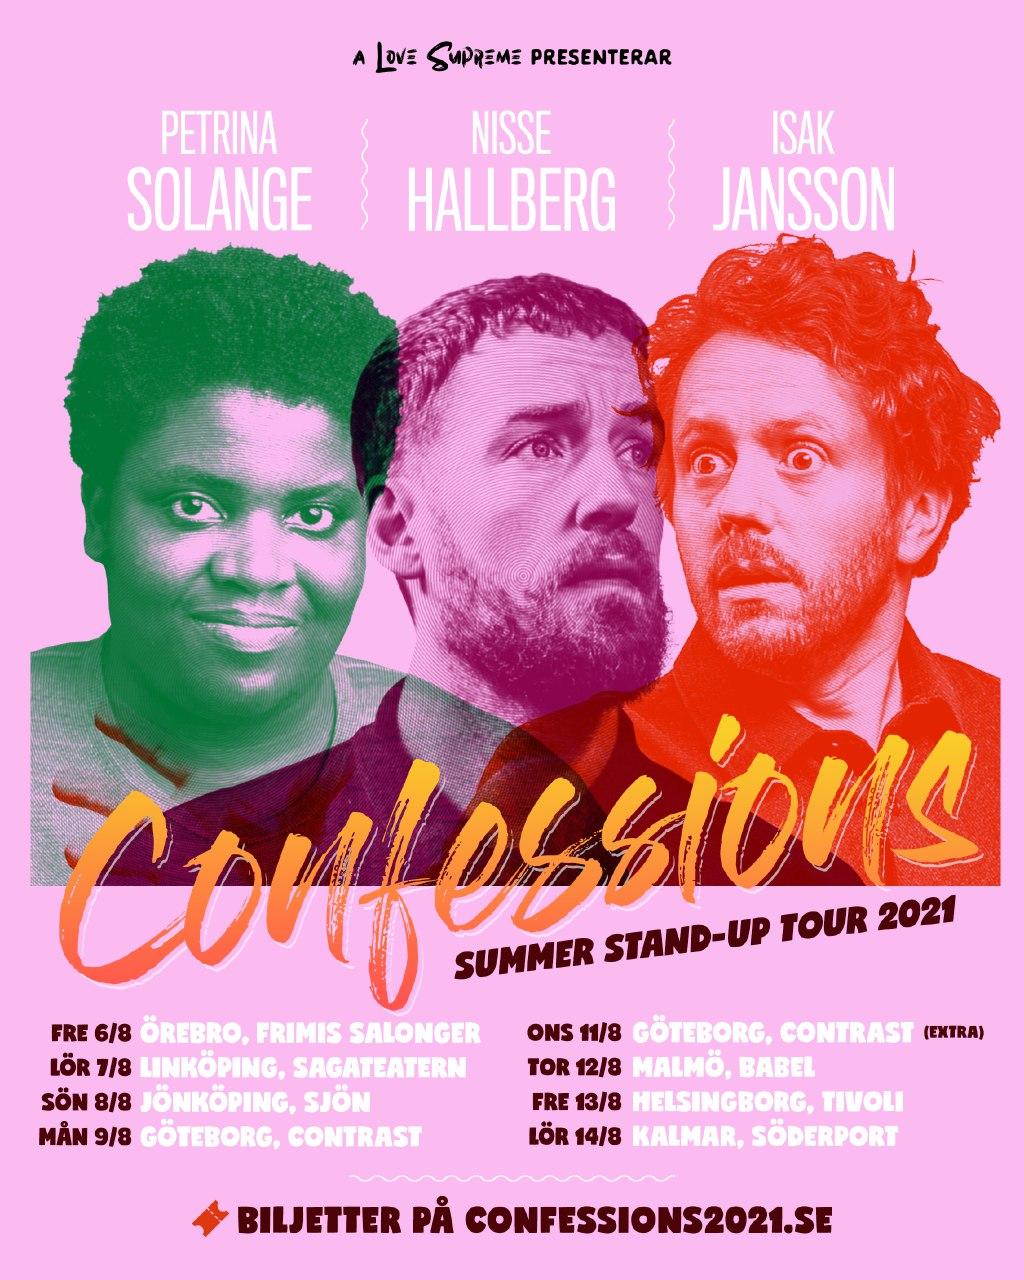 210812 : Confessions med Petrina Solange, Nisse Hallberg och Isak Jansson